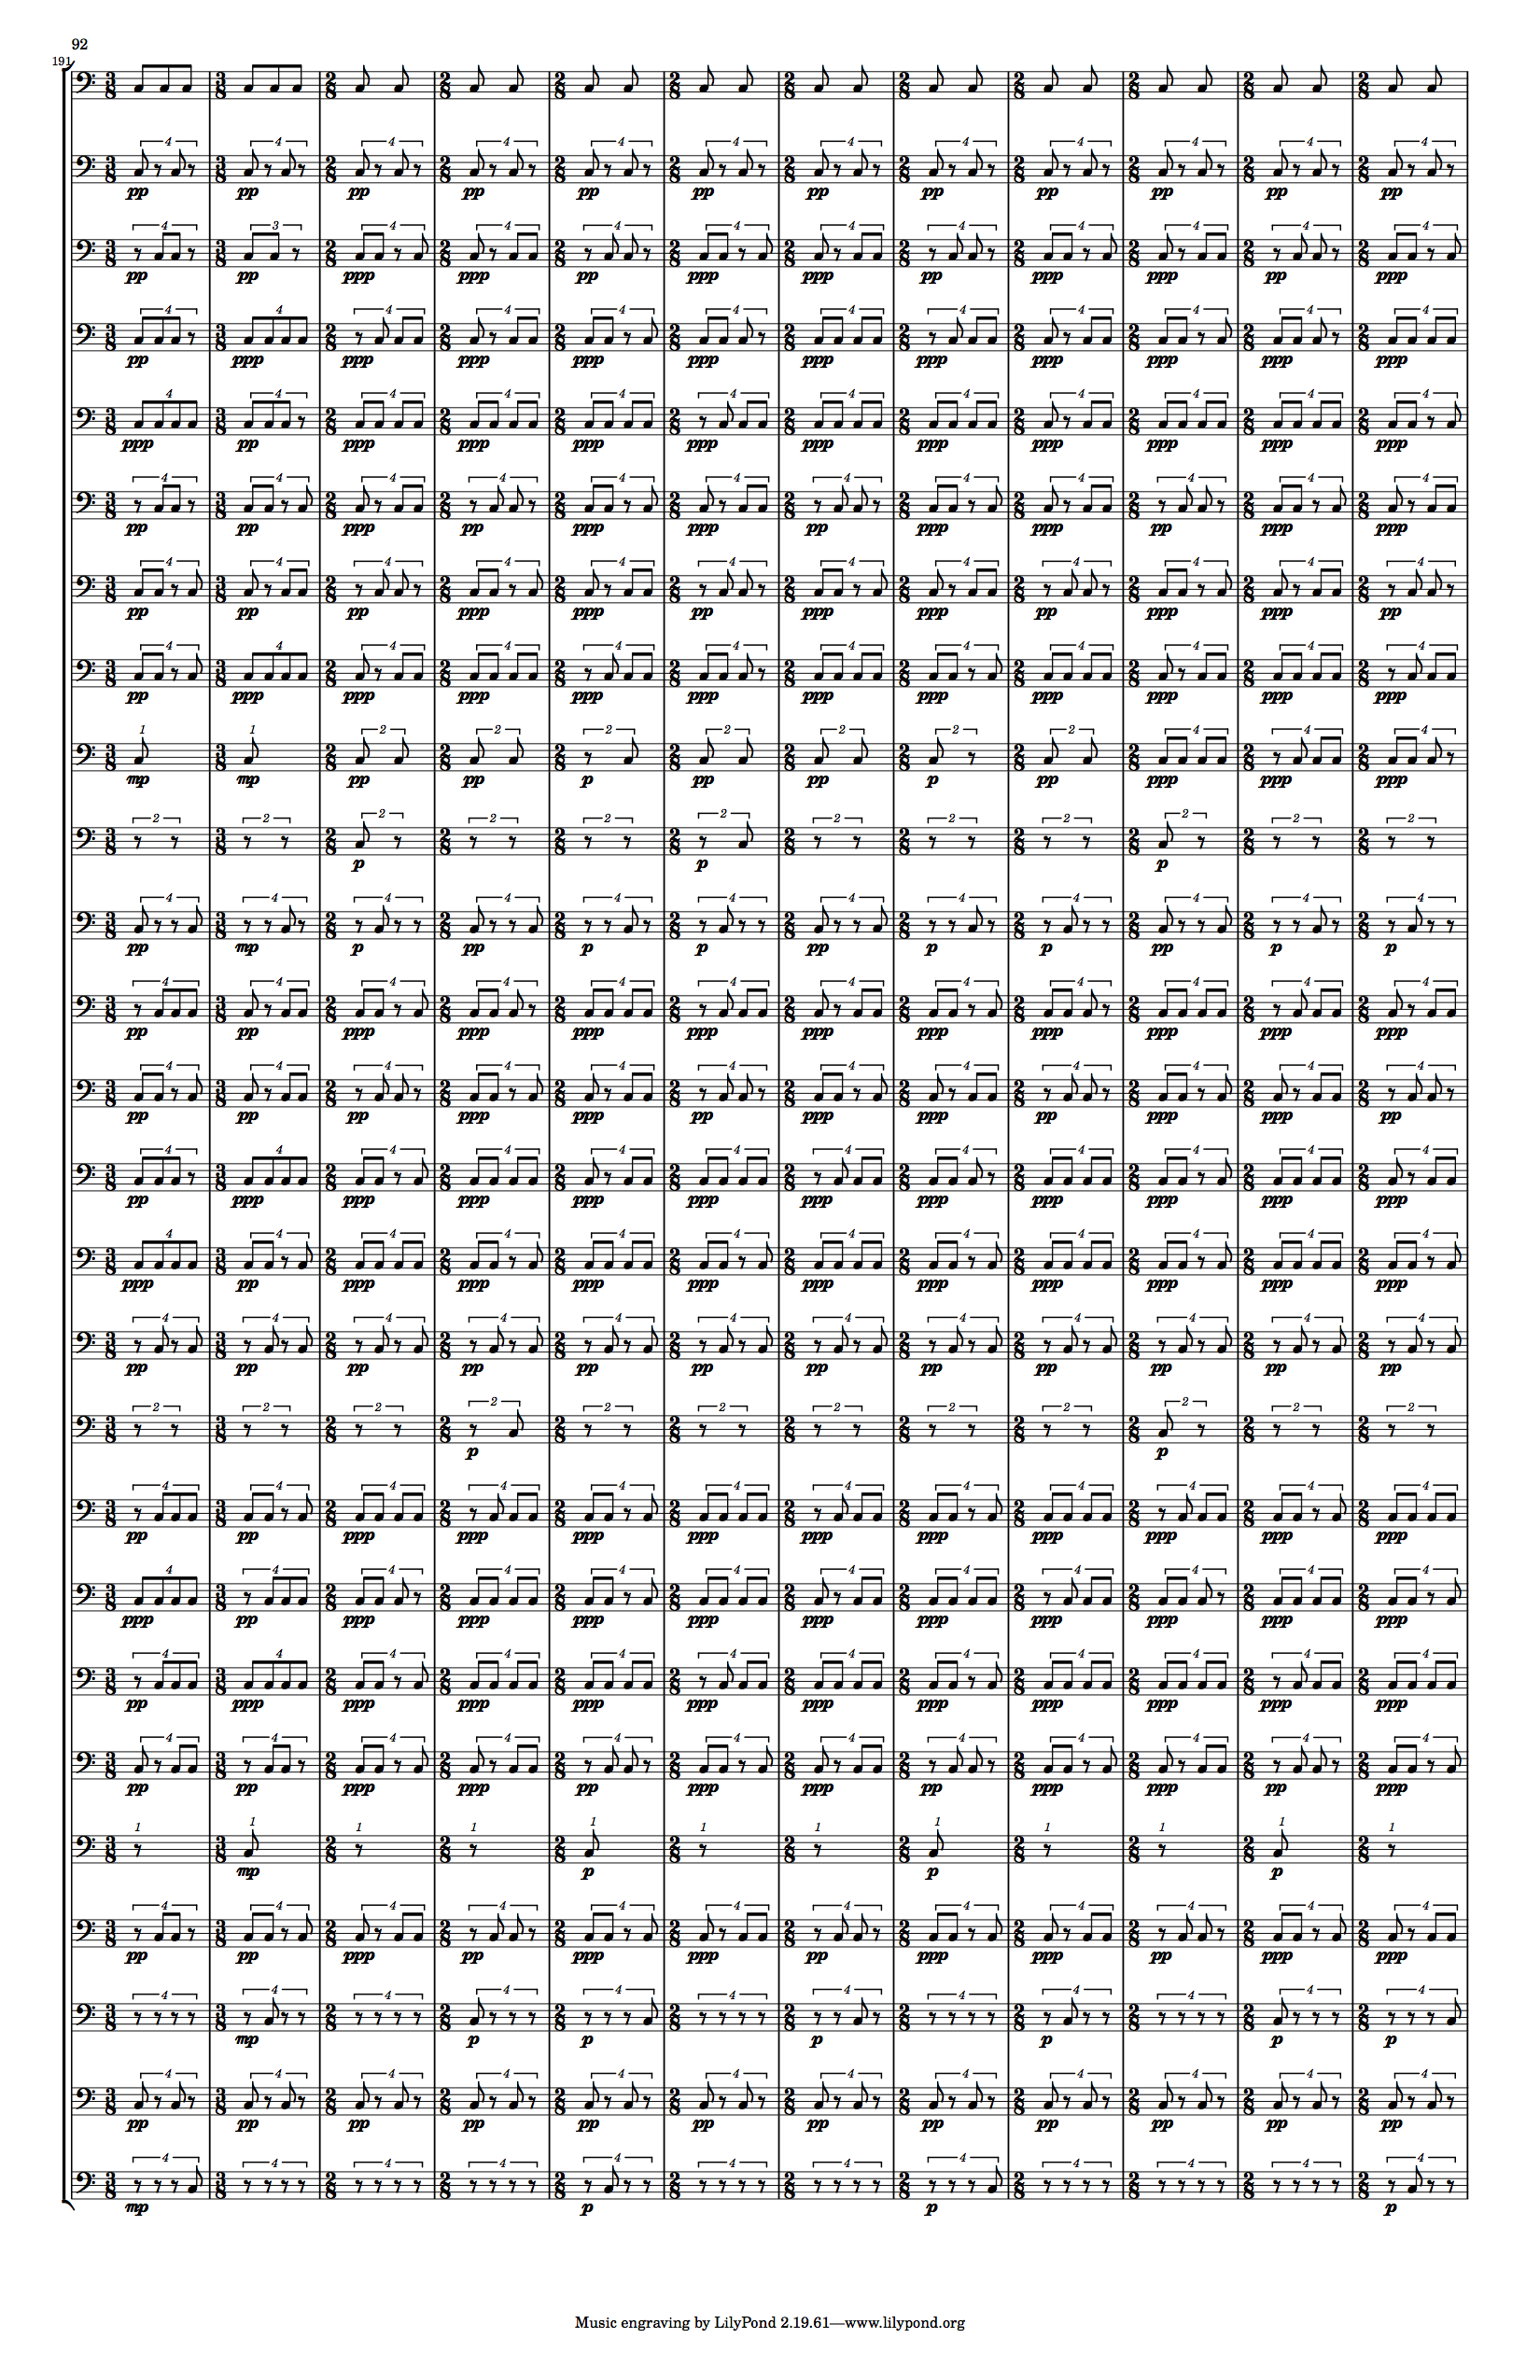 dynamics/v1/page92